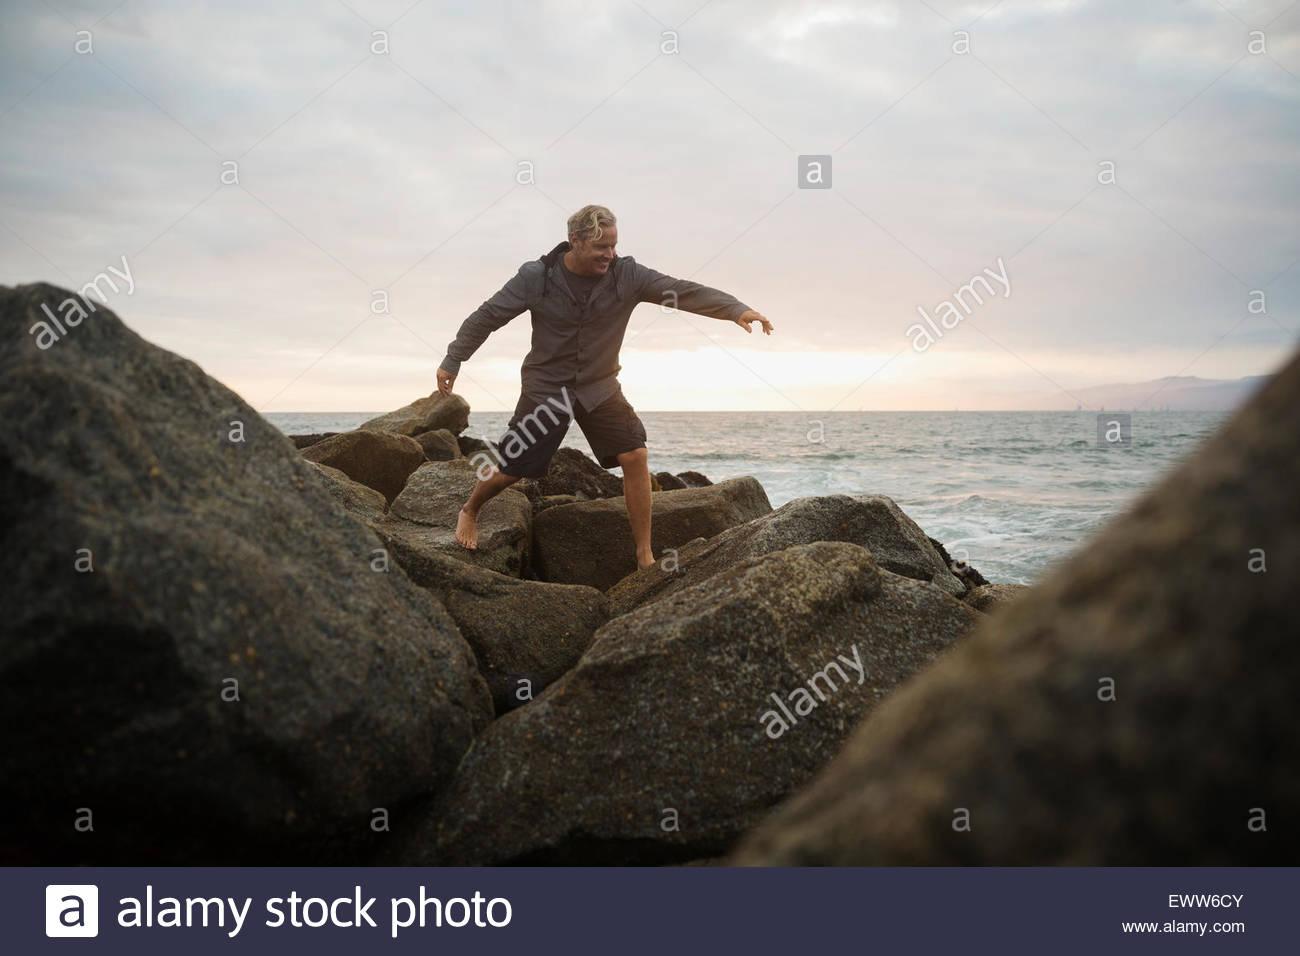 Man stepping on ocean rocks at sunset - Stock Image